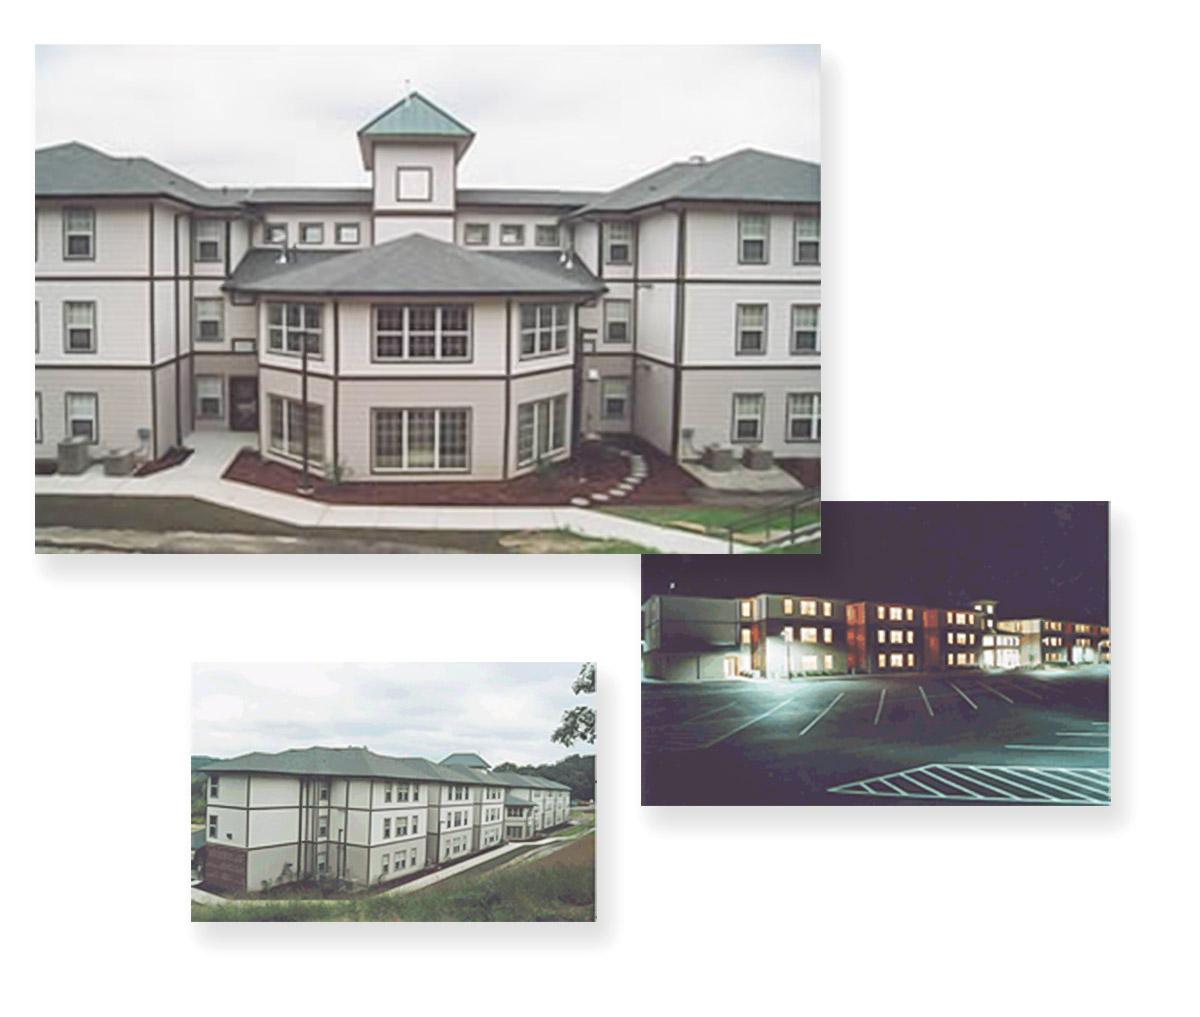 Teikyo Post University, Waterbury, Connecticut